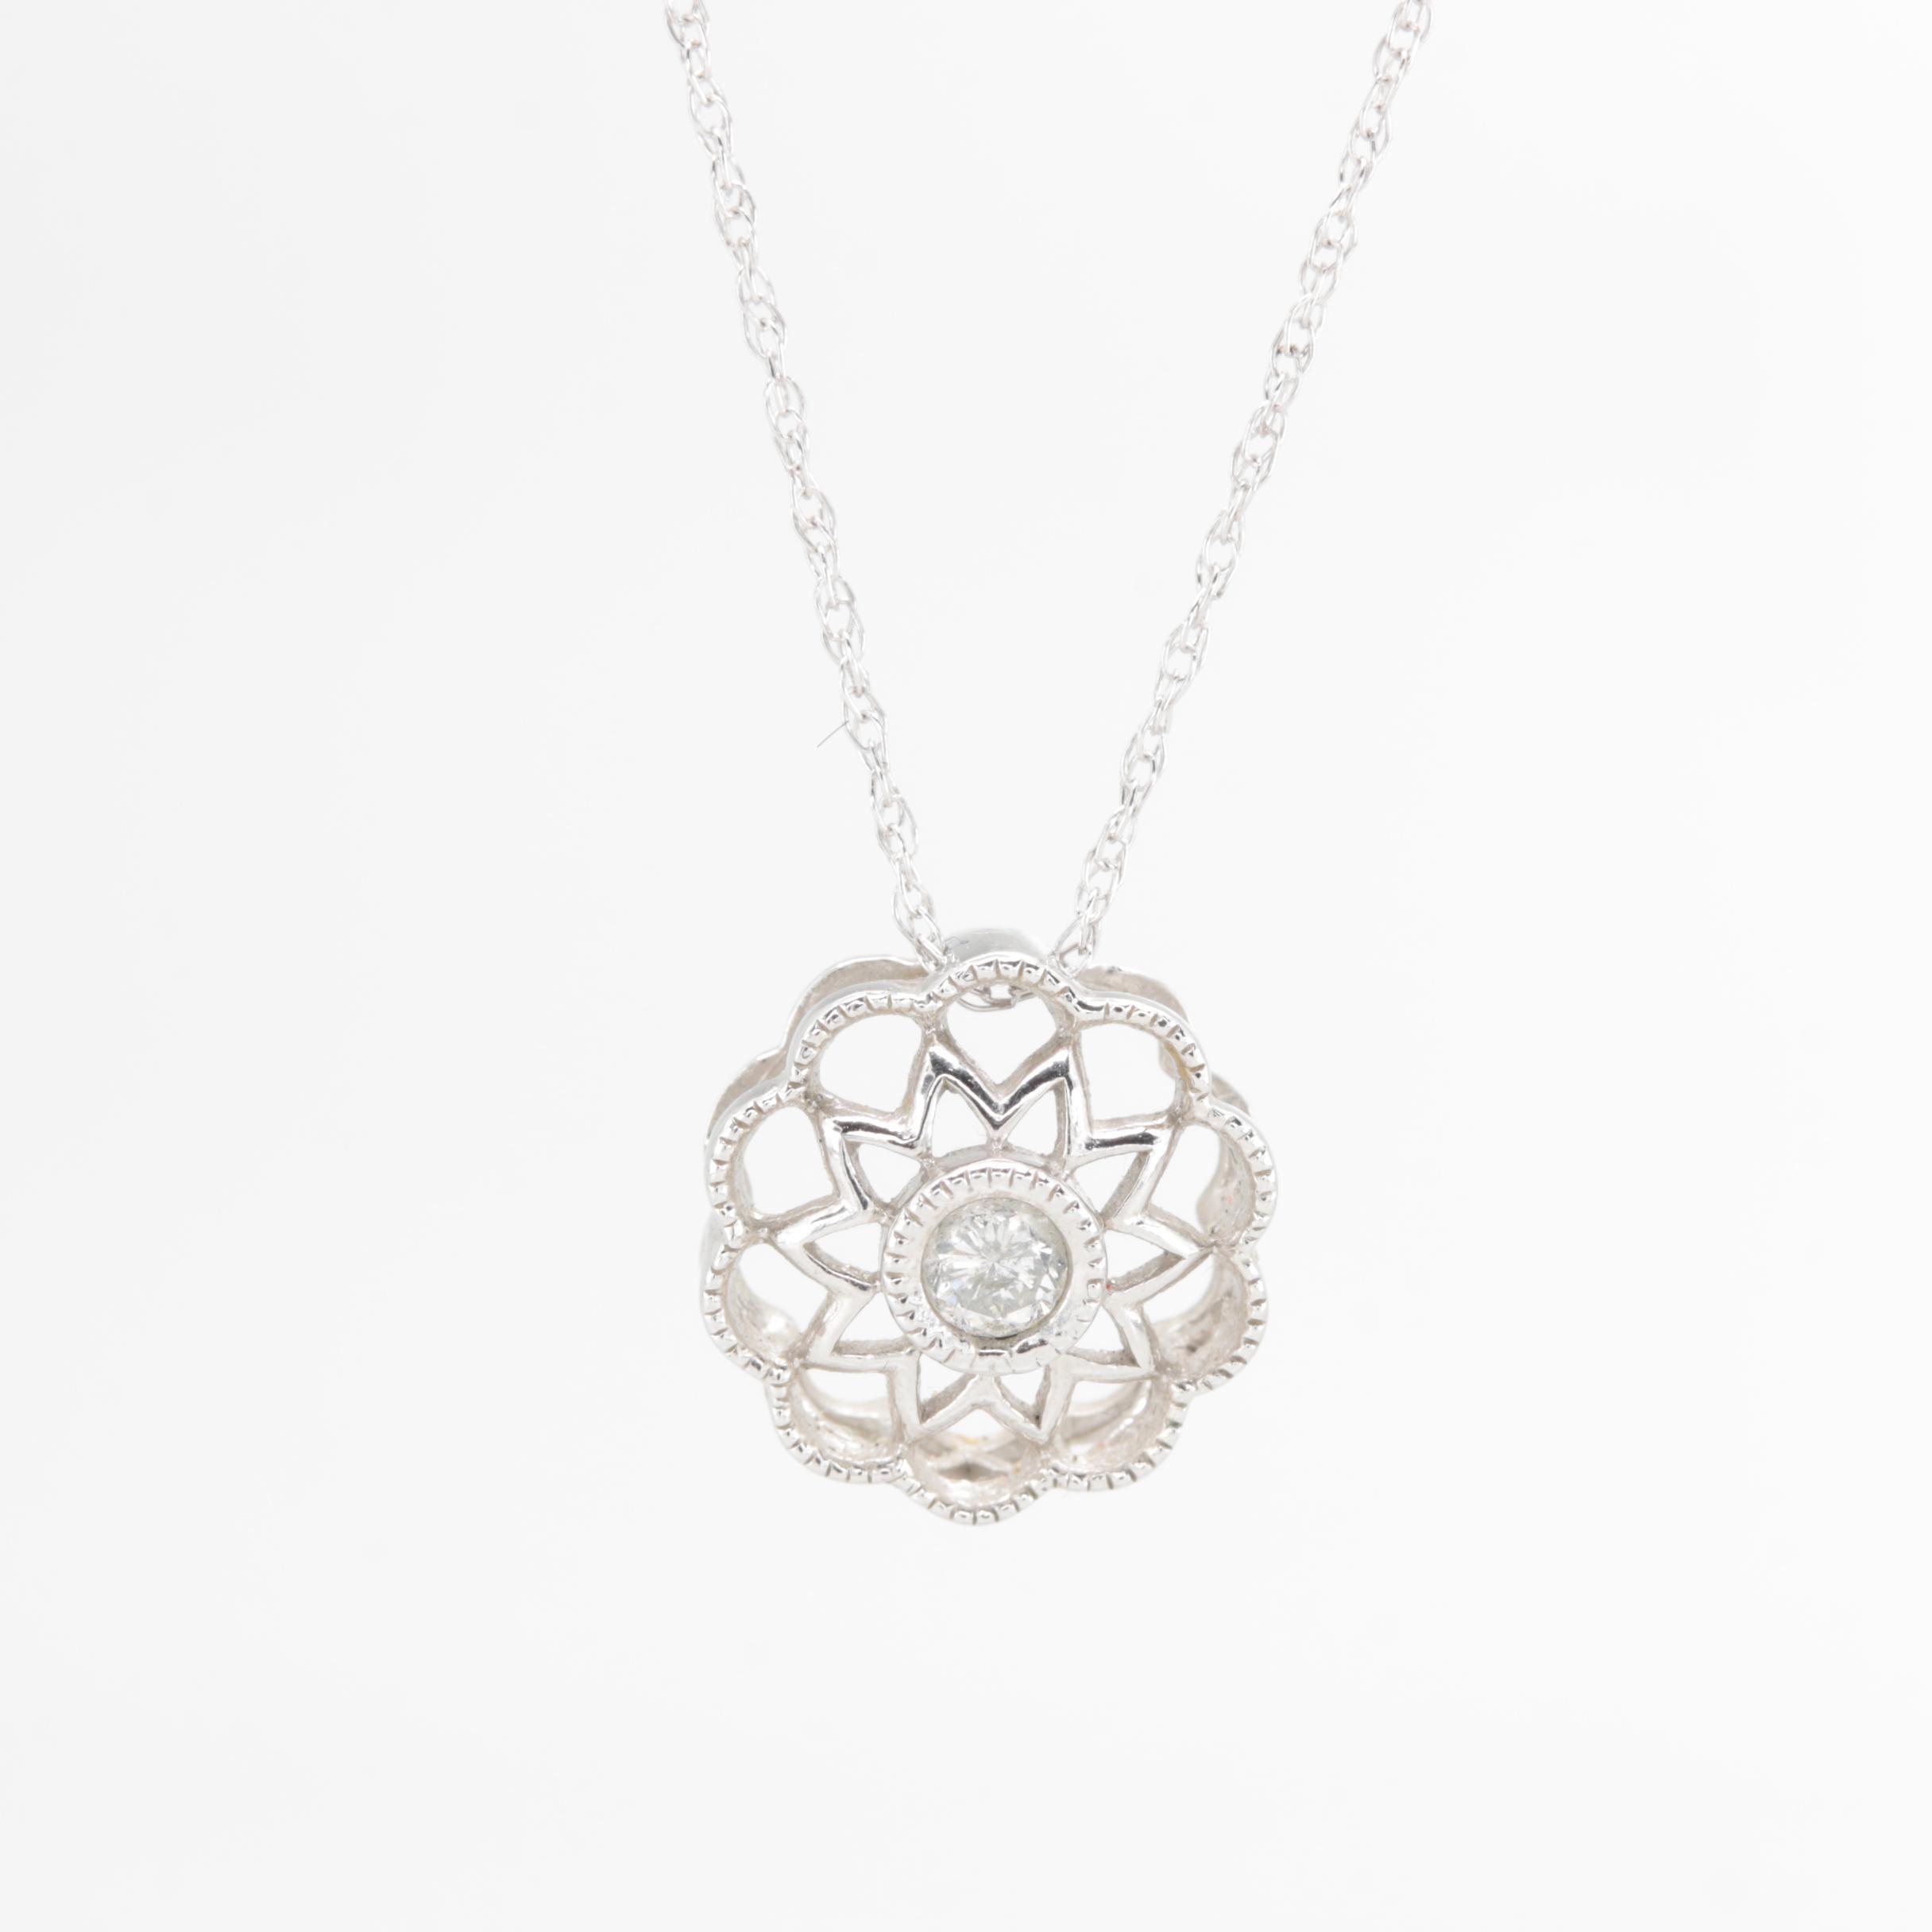 Alwand Vahan 10K White Gold Diamond Pendant Necklace